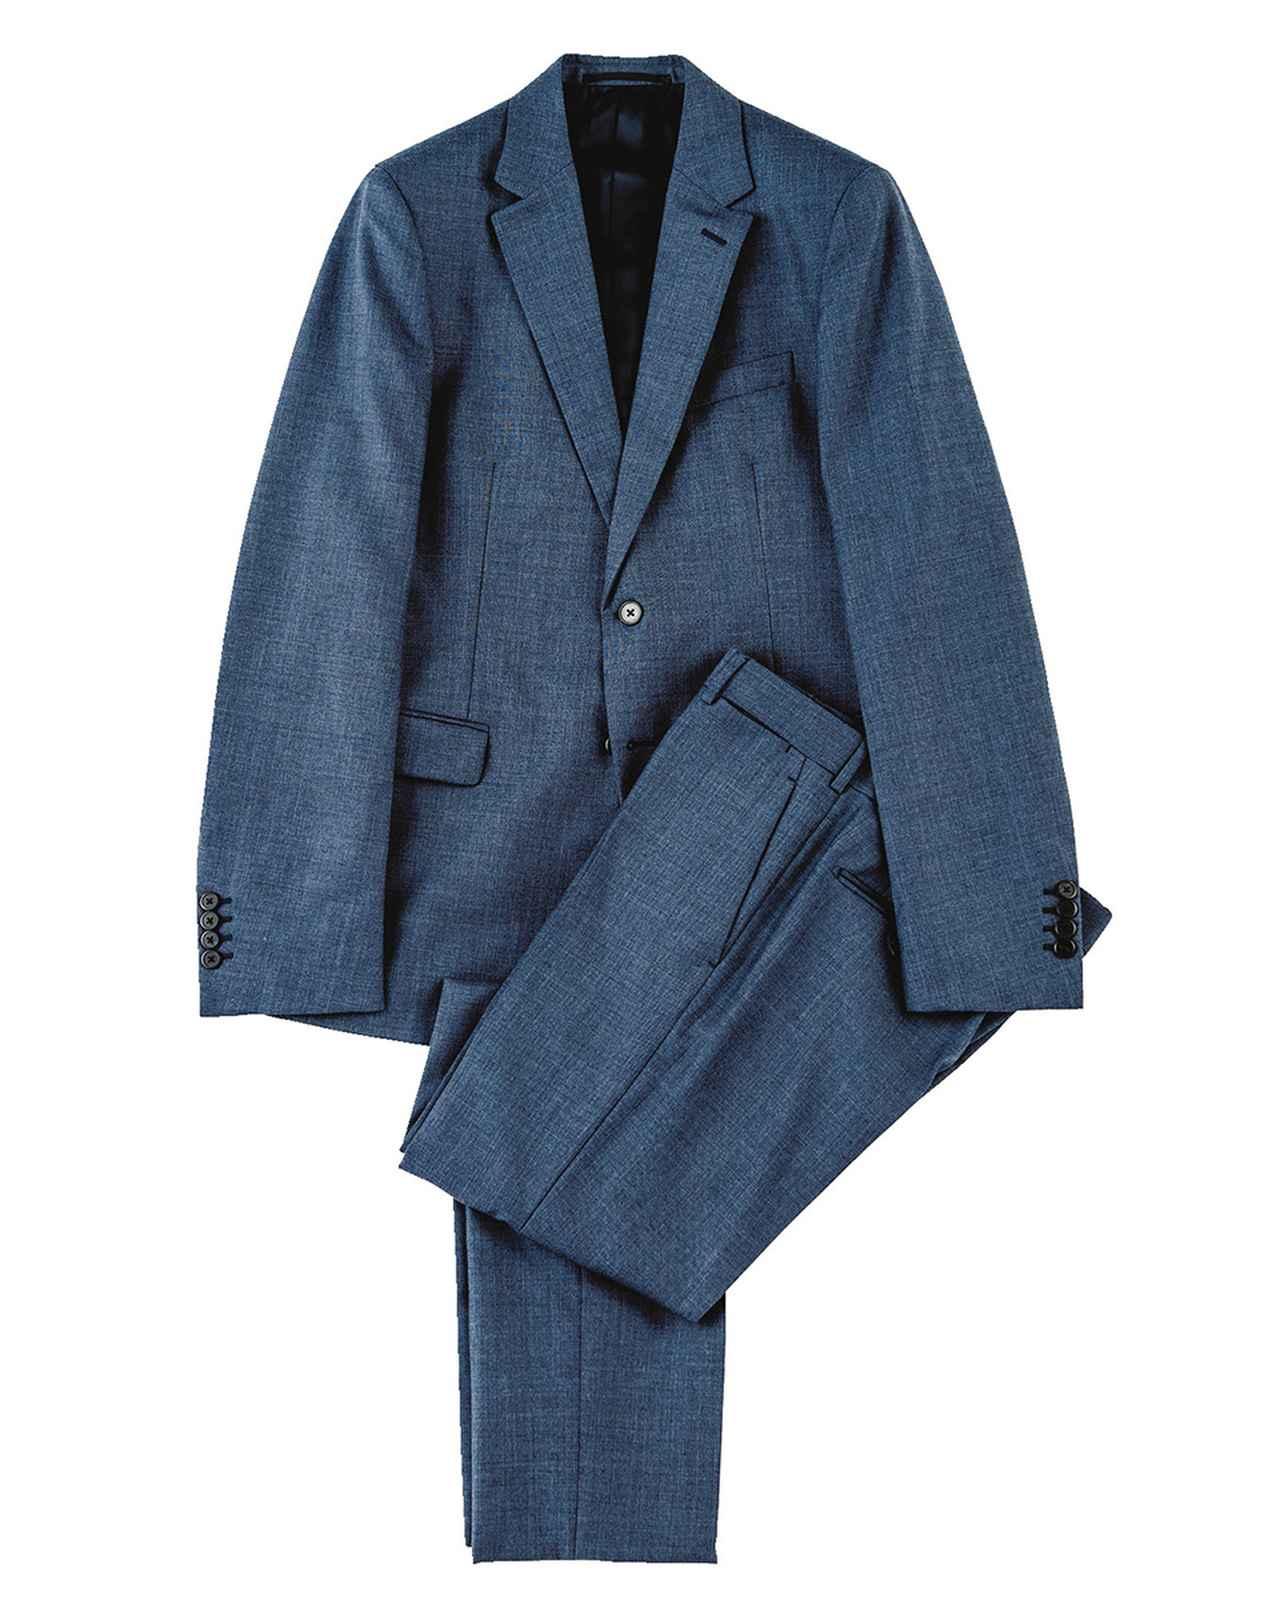 Images : スーツ